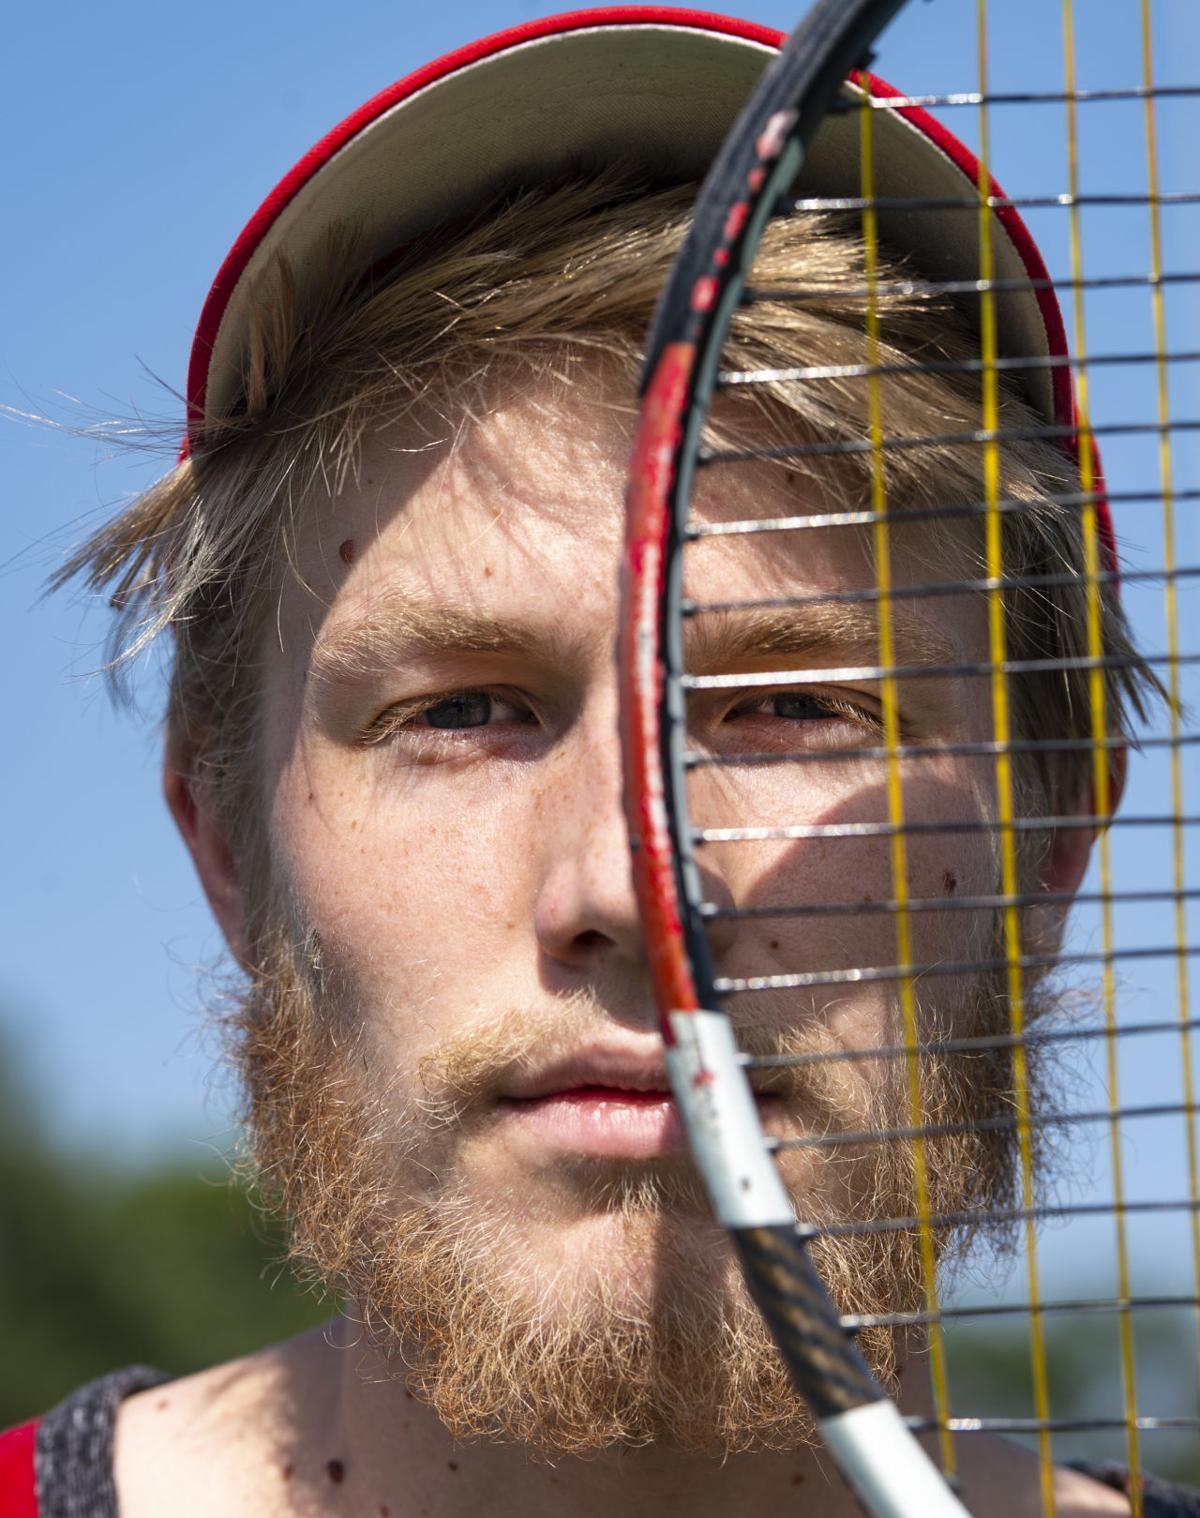 081418-s-boys tennis-001.JPG